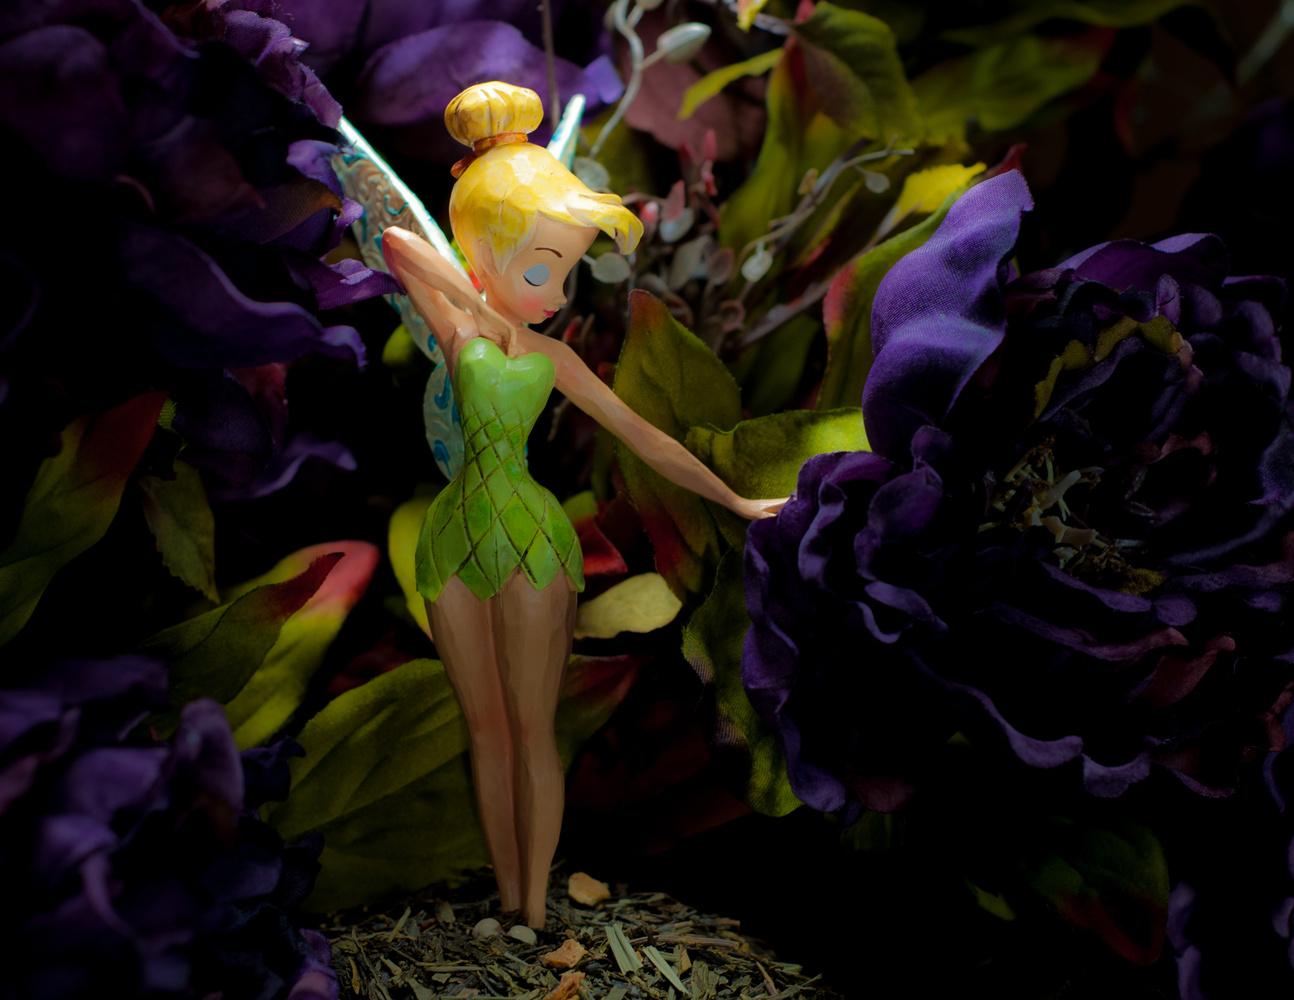 Enchanted Forrest by Ivan Guzman